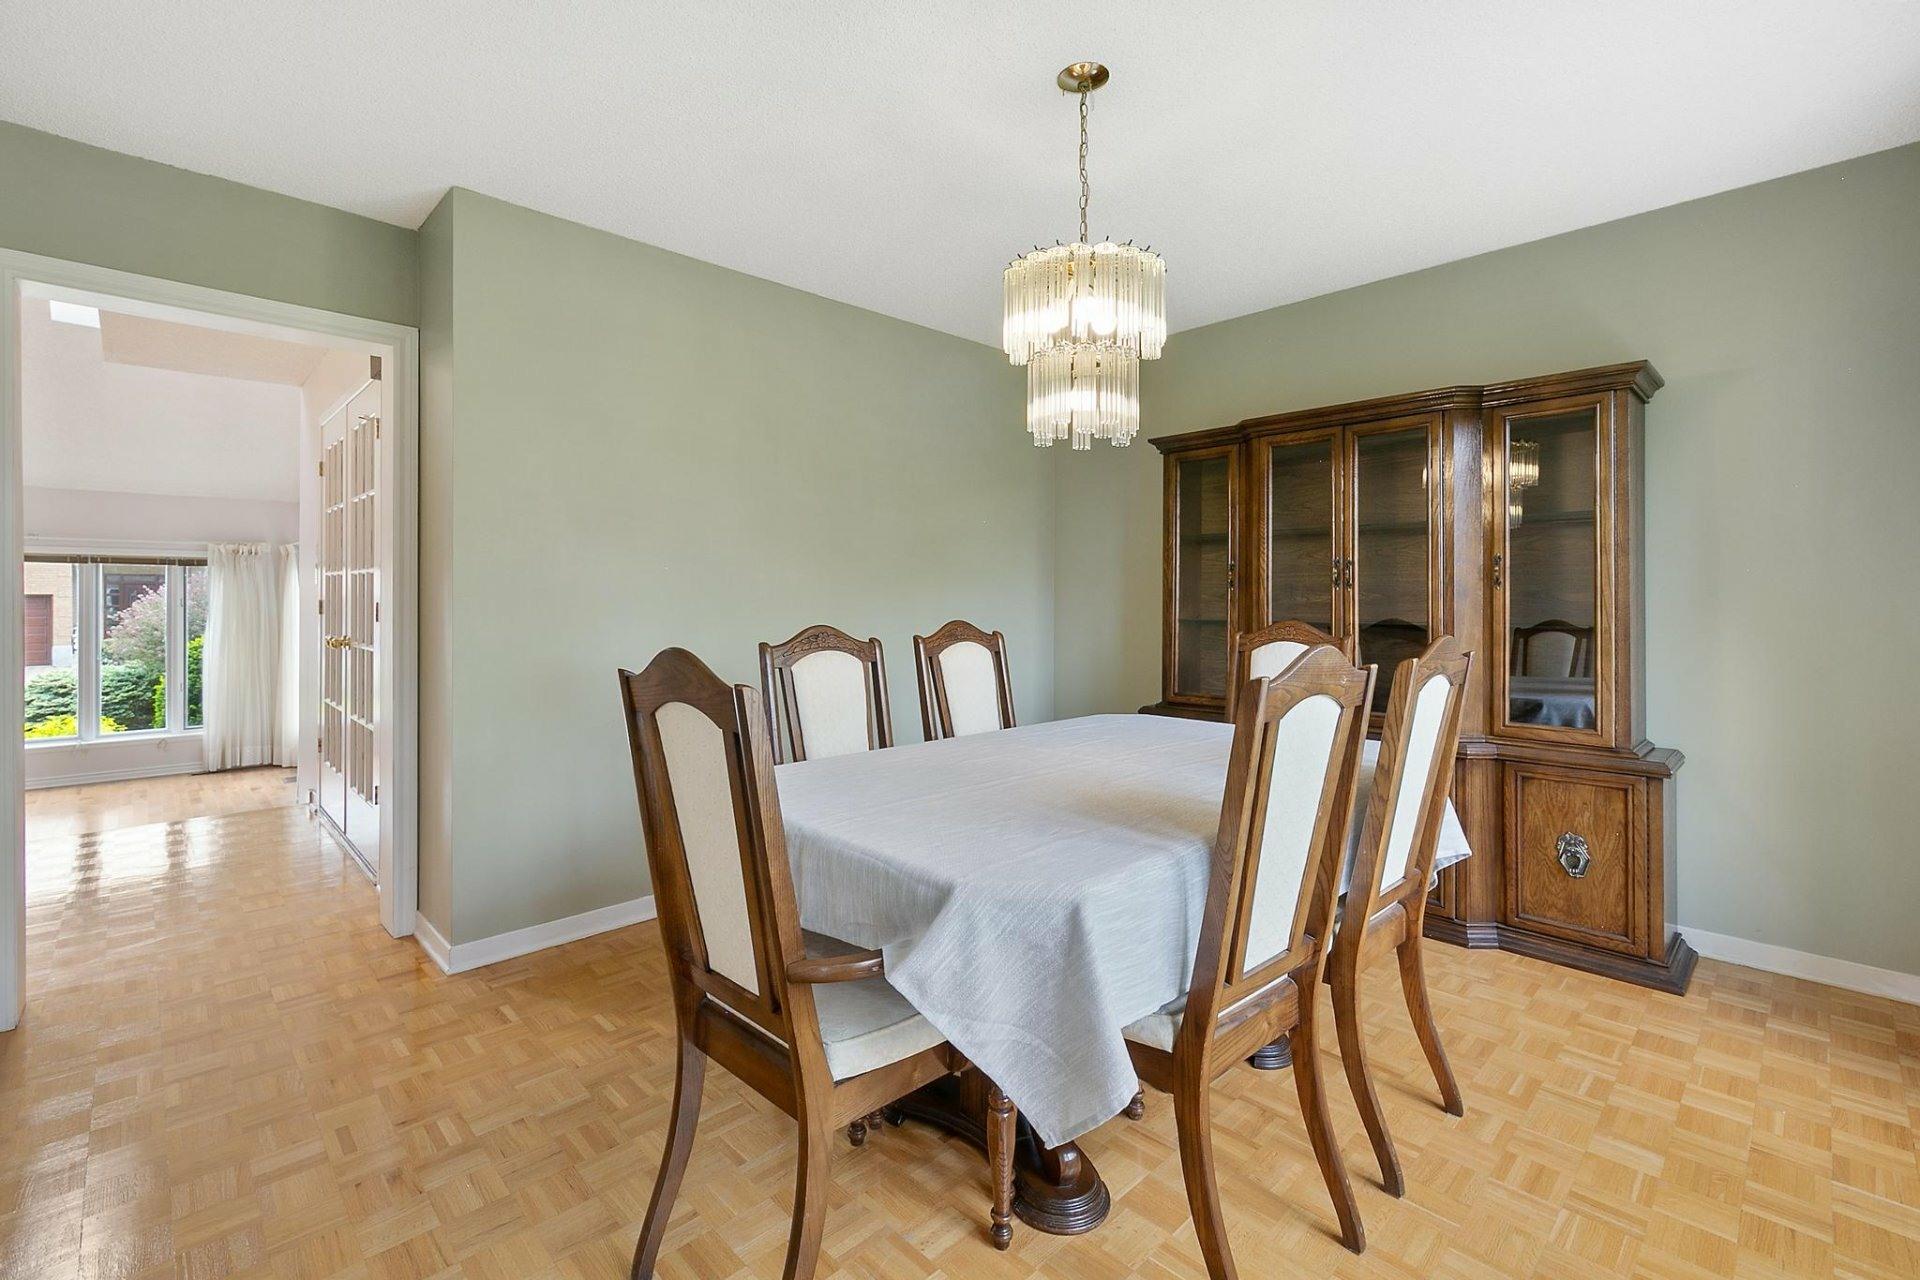 image 5 - House For sale Kirkland - 12 rooms